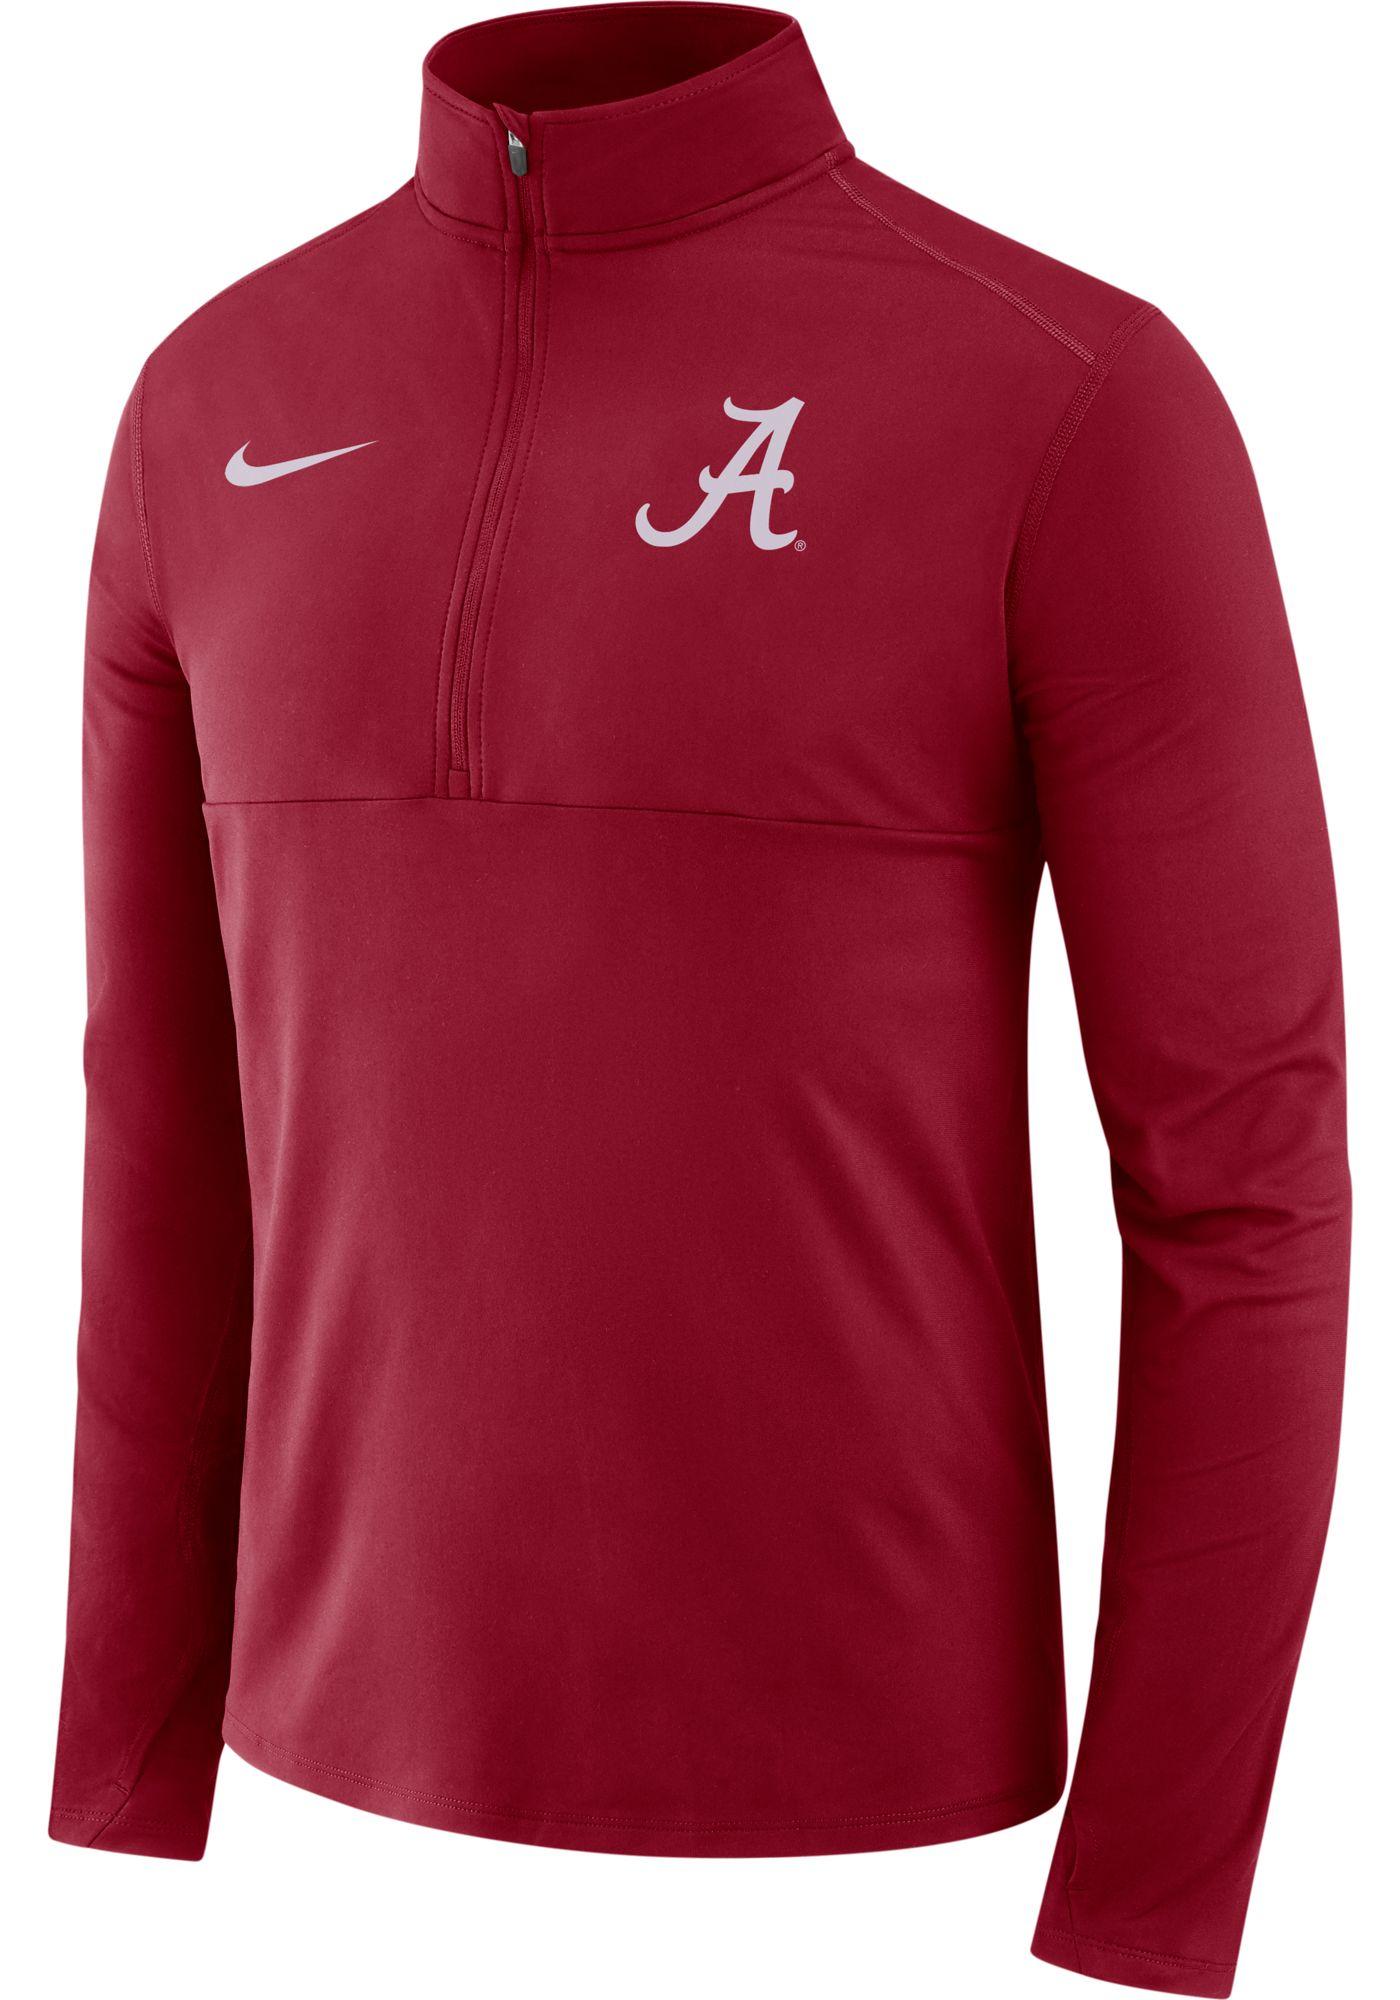 Nike Men's Alabama Crimson Tide Crimson Long Sleeve Core Half-Zip Shirt